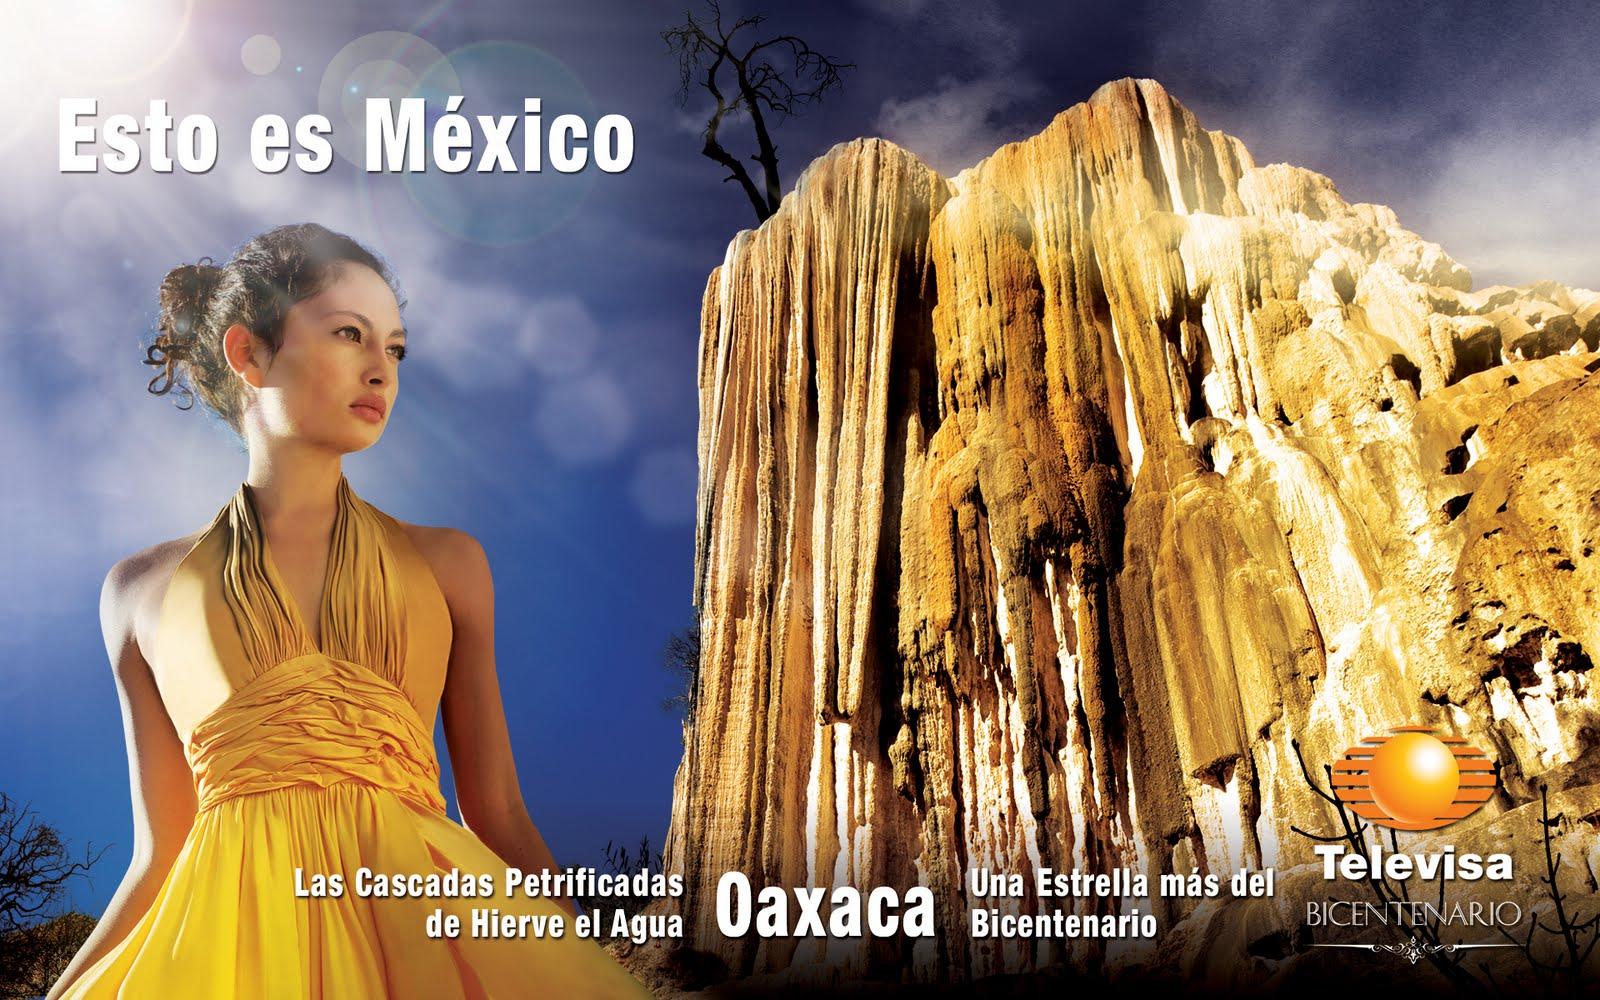 http://1.bp.blogspot.com/_DXPmhYwKhEA/TDzozQKNINI/AAAAAAAAABk/VVOdG6VuWls/s1600/Oaxacahierveagua.jpg